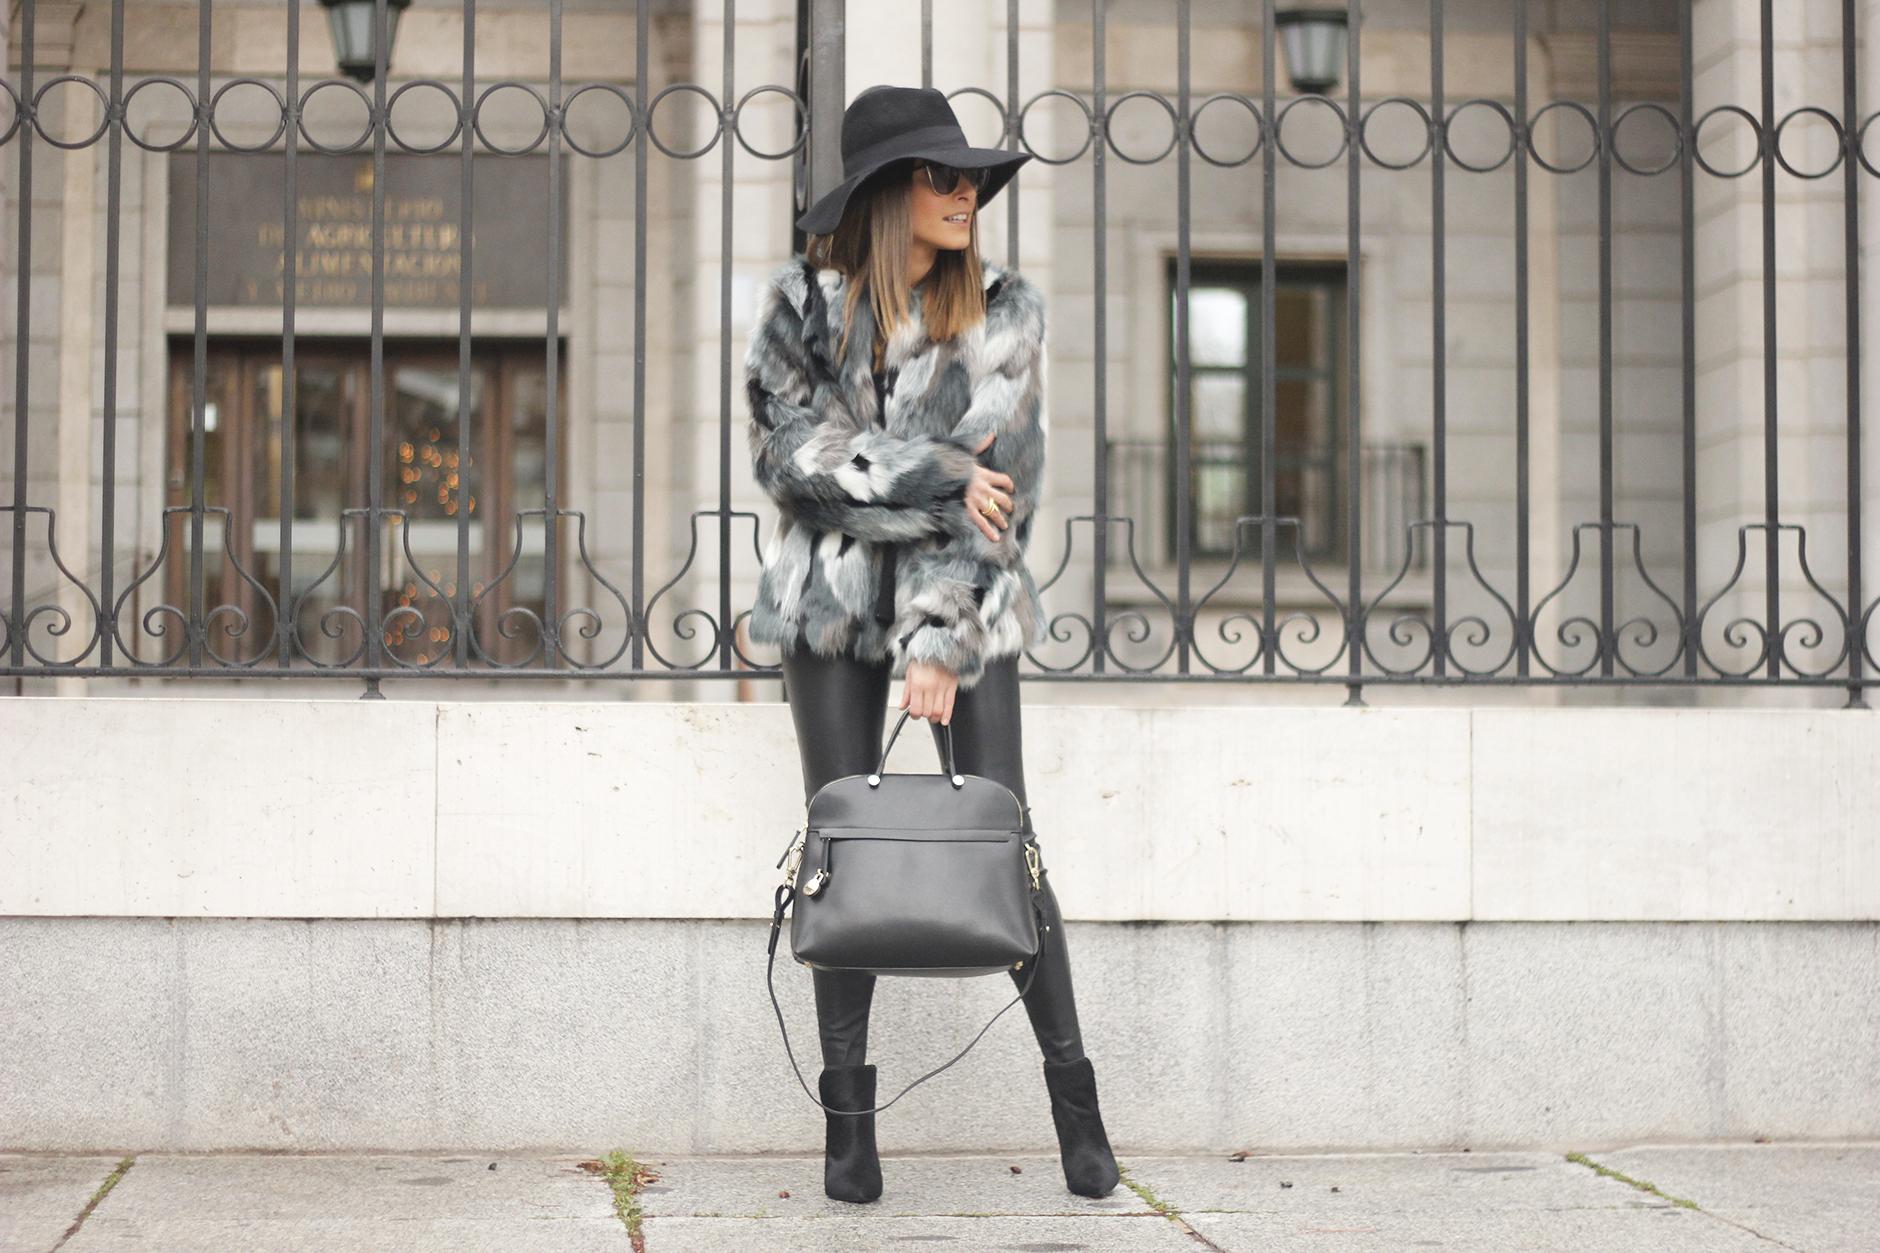 Faux fur coat leatherette pants booties black hat mango streetstyle fashion outfit14